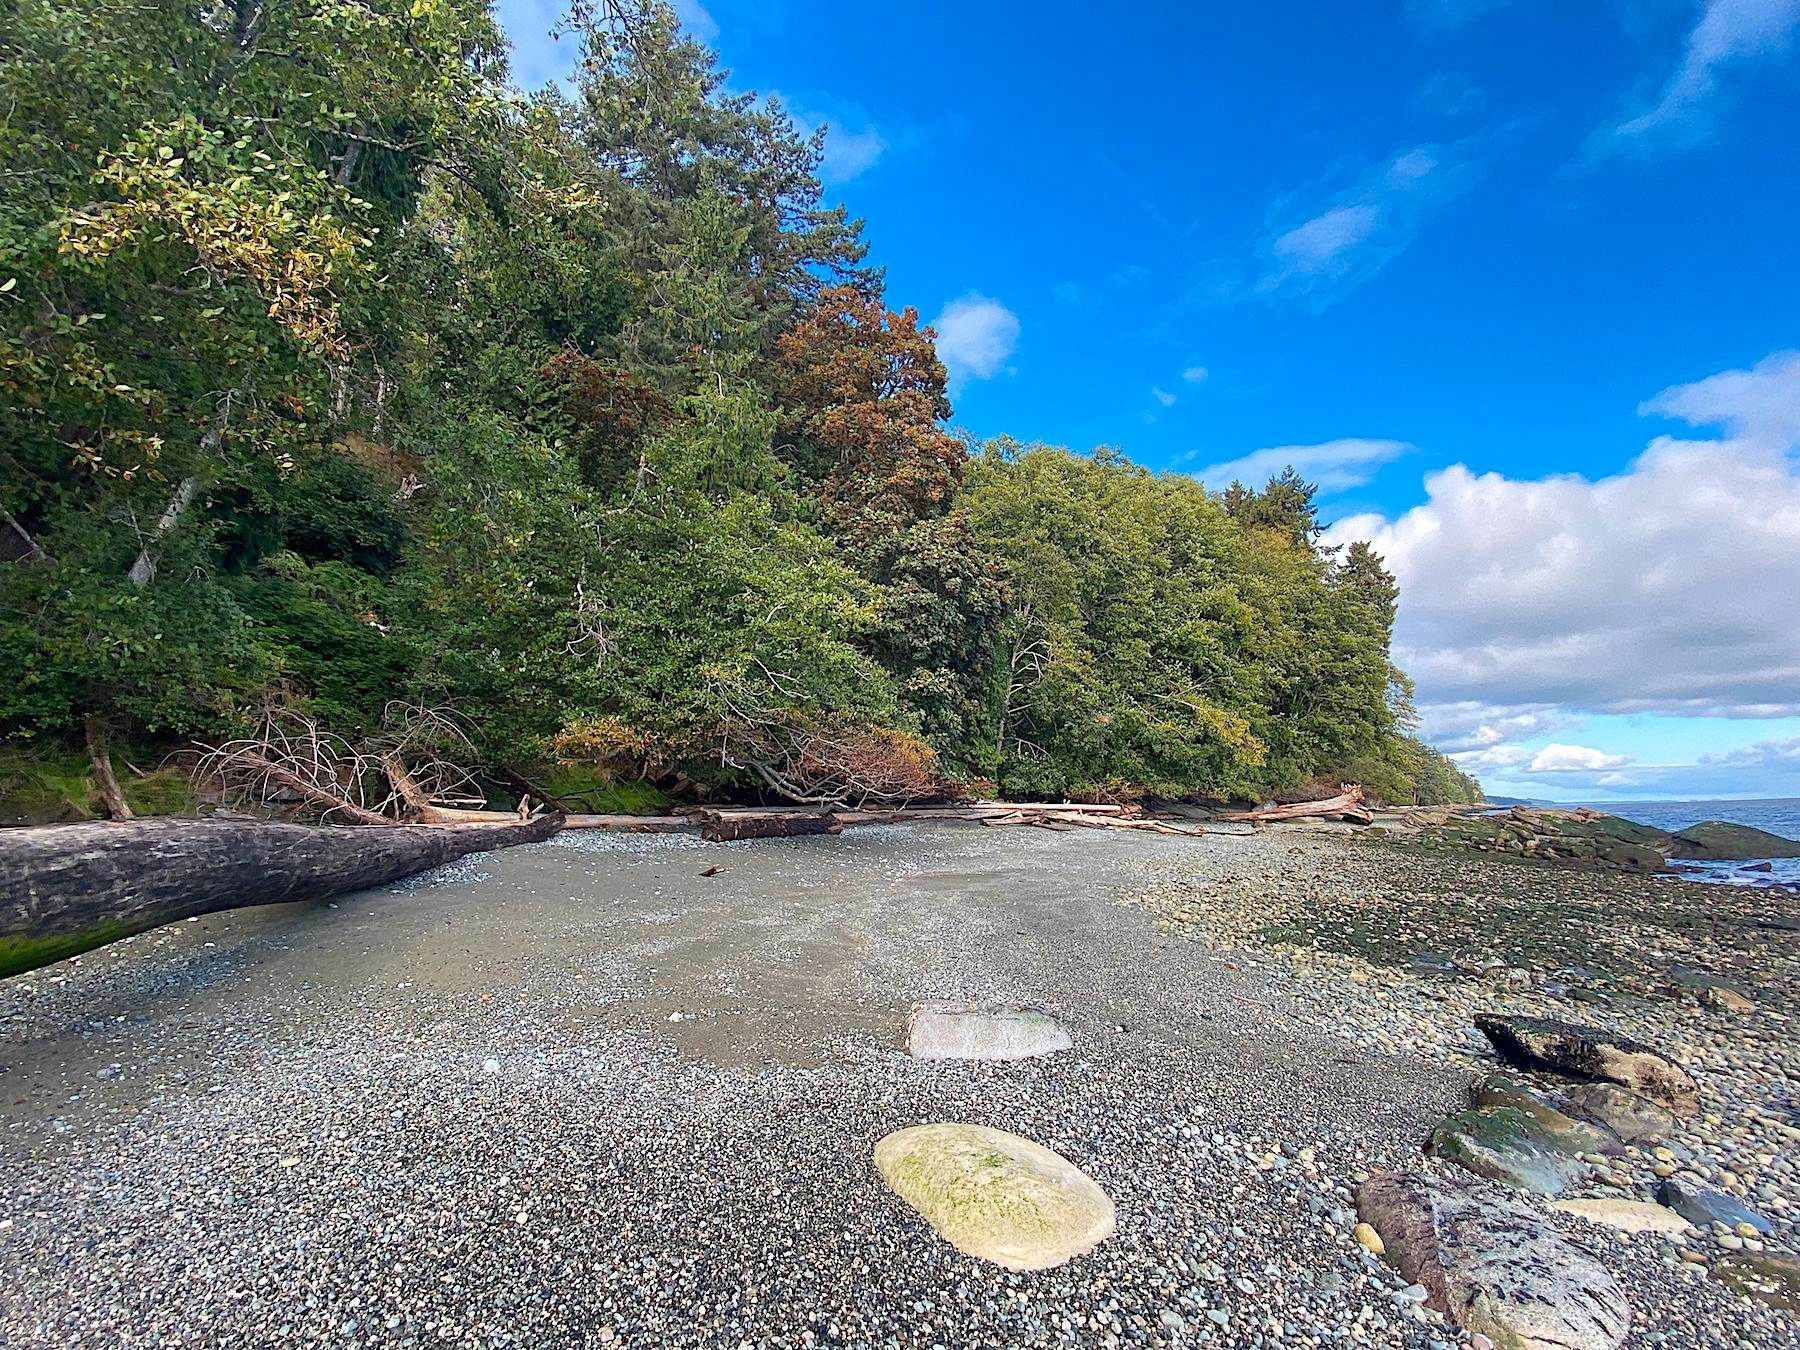 Main Photo: Lot 18 DL 71: Galiano Island Land for sale (Islands-Van. & Gulf)  : MLS®# R2617465